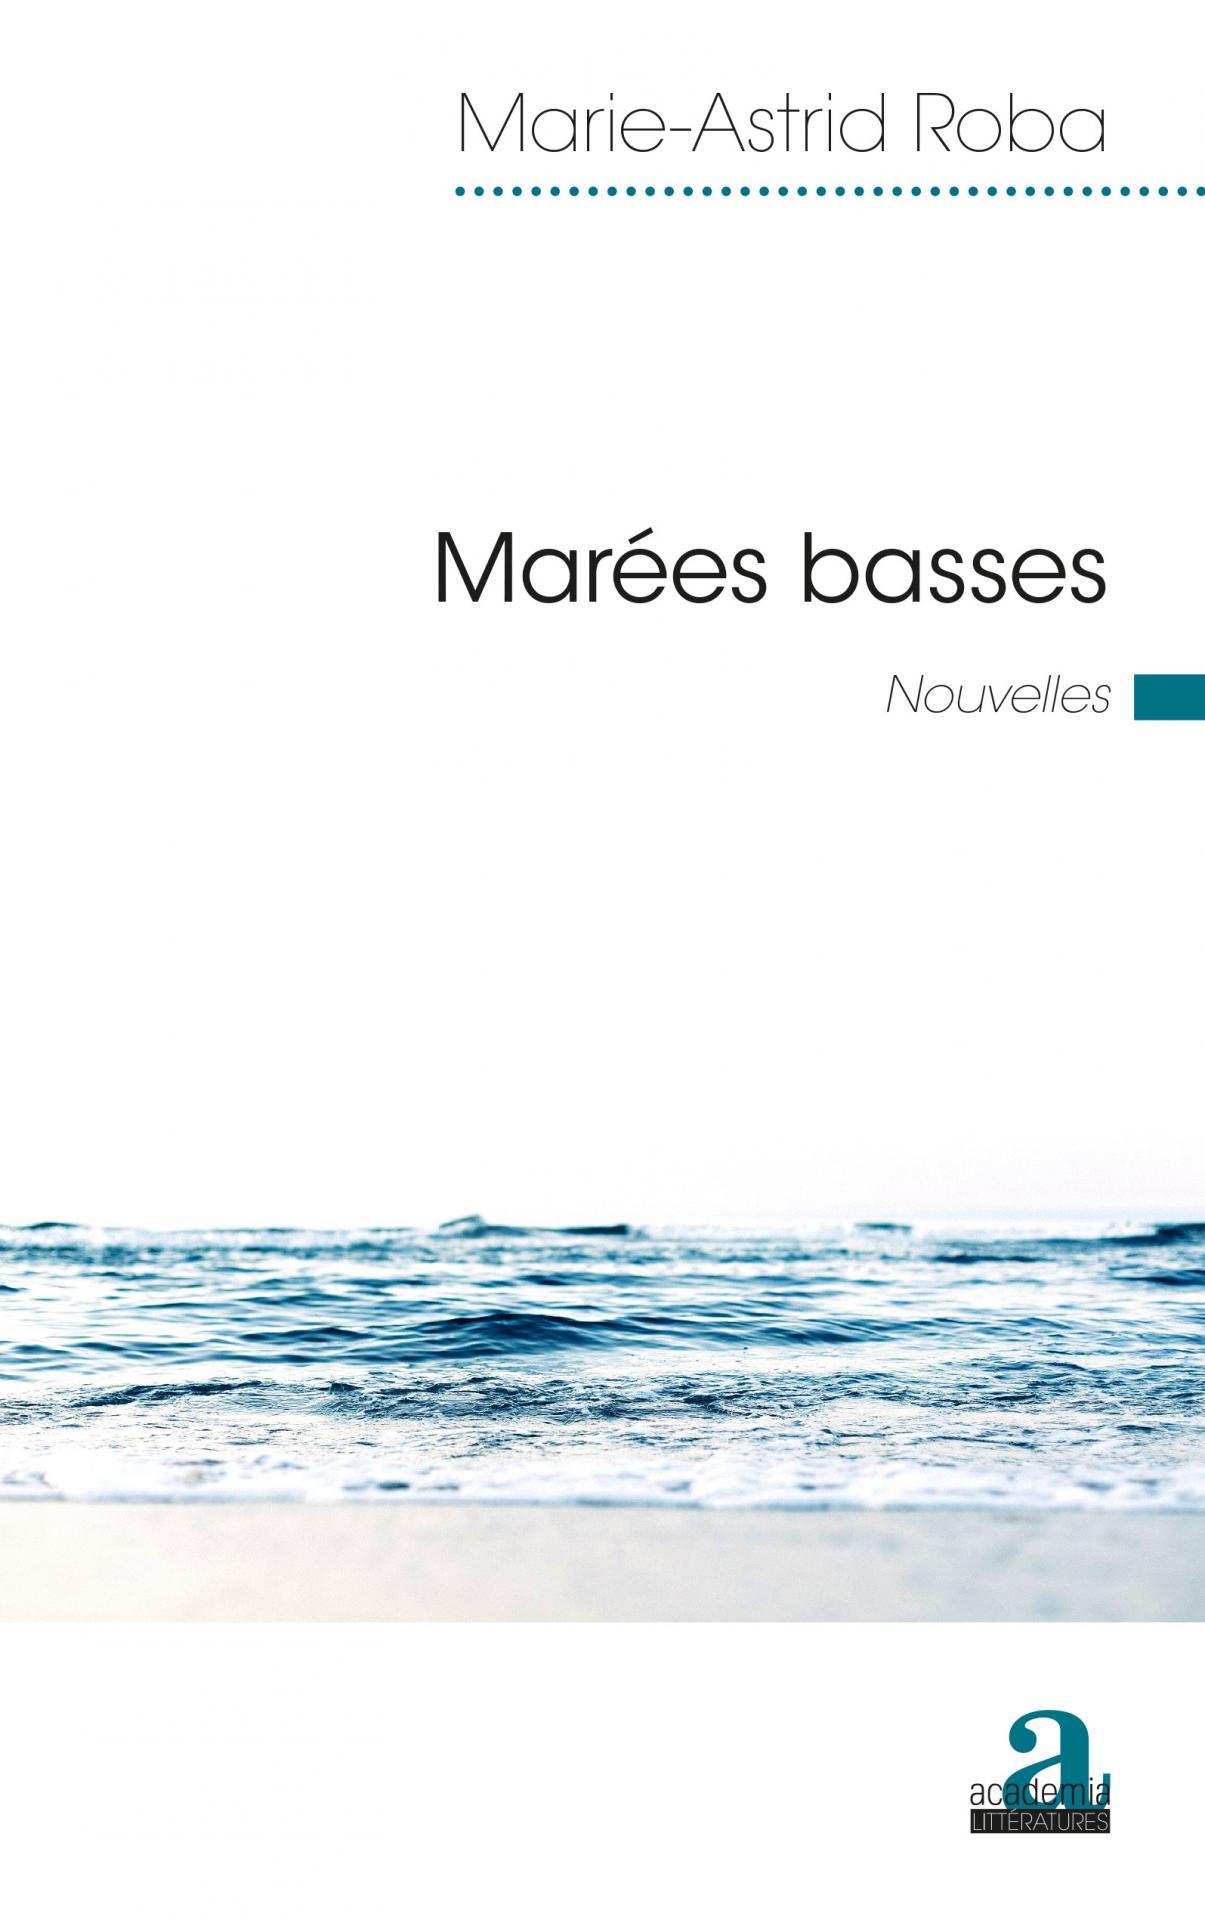 Marees basses